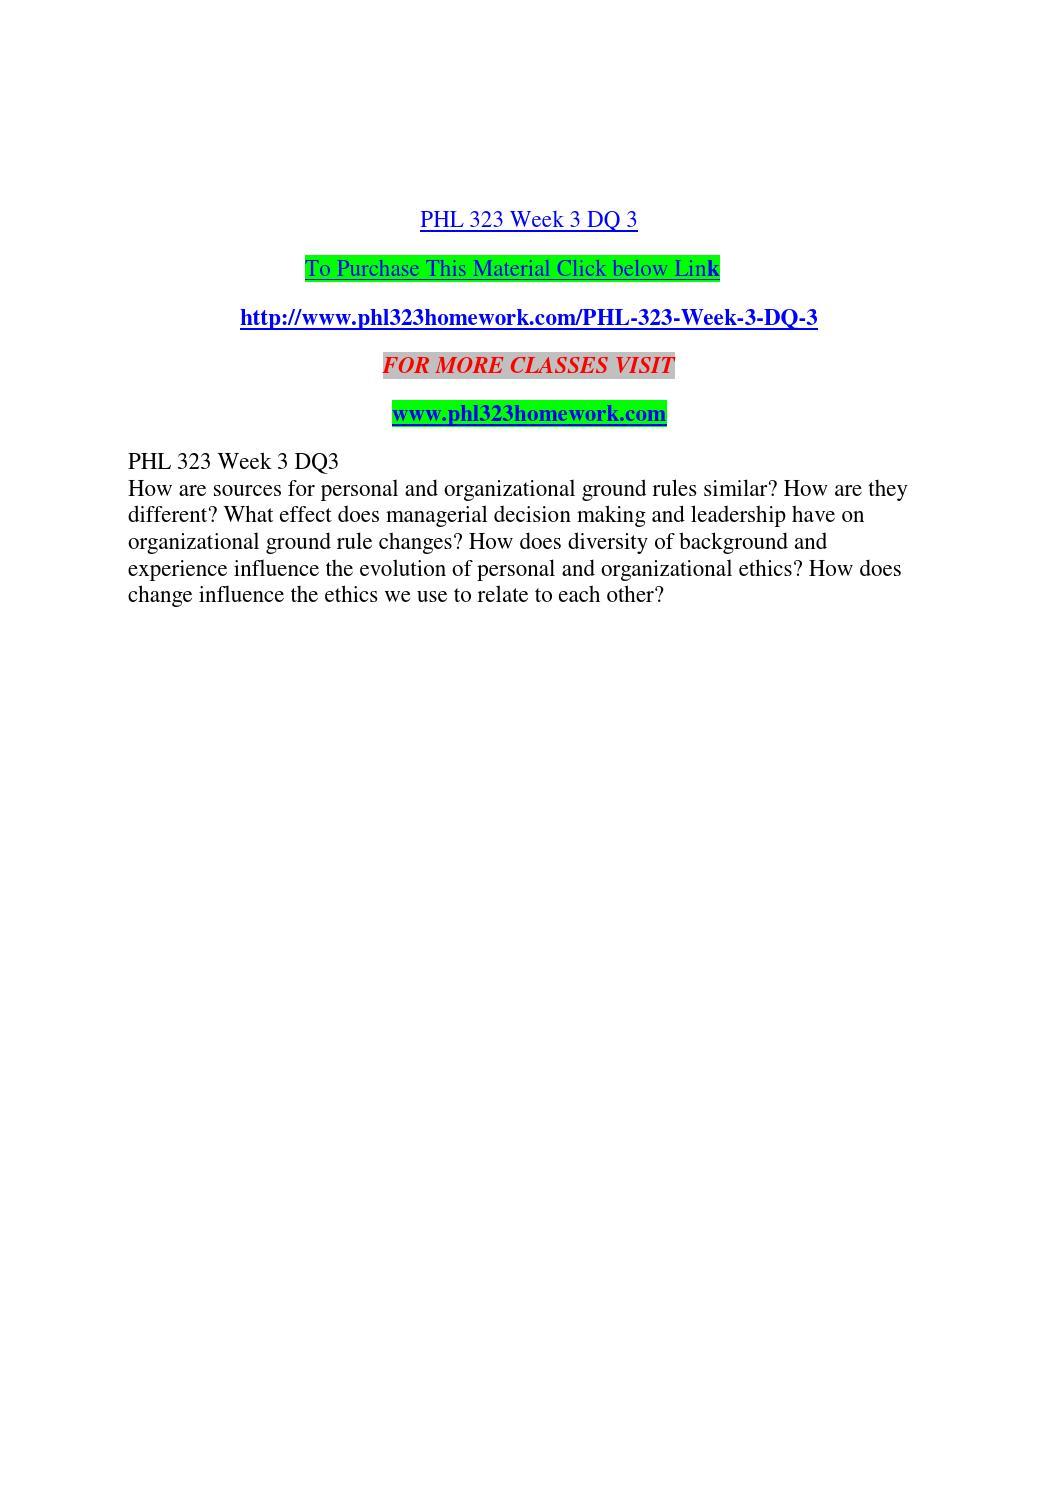 PHL 323 Personal Ethics Development